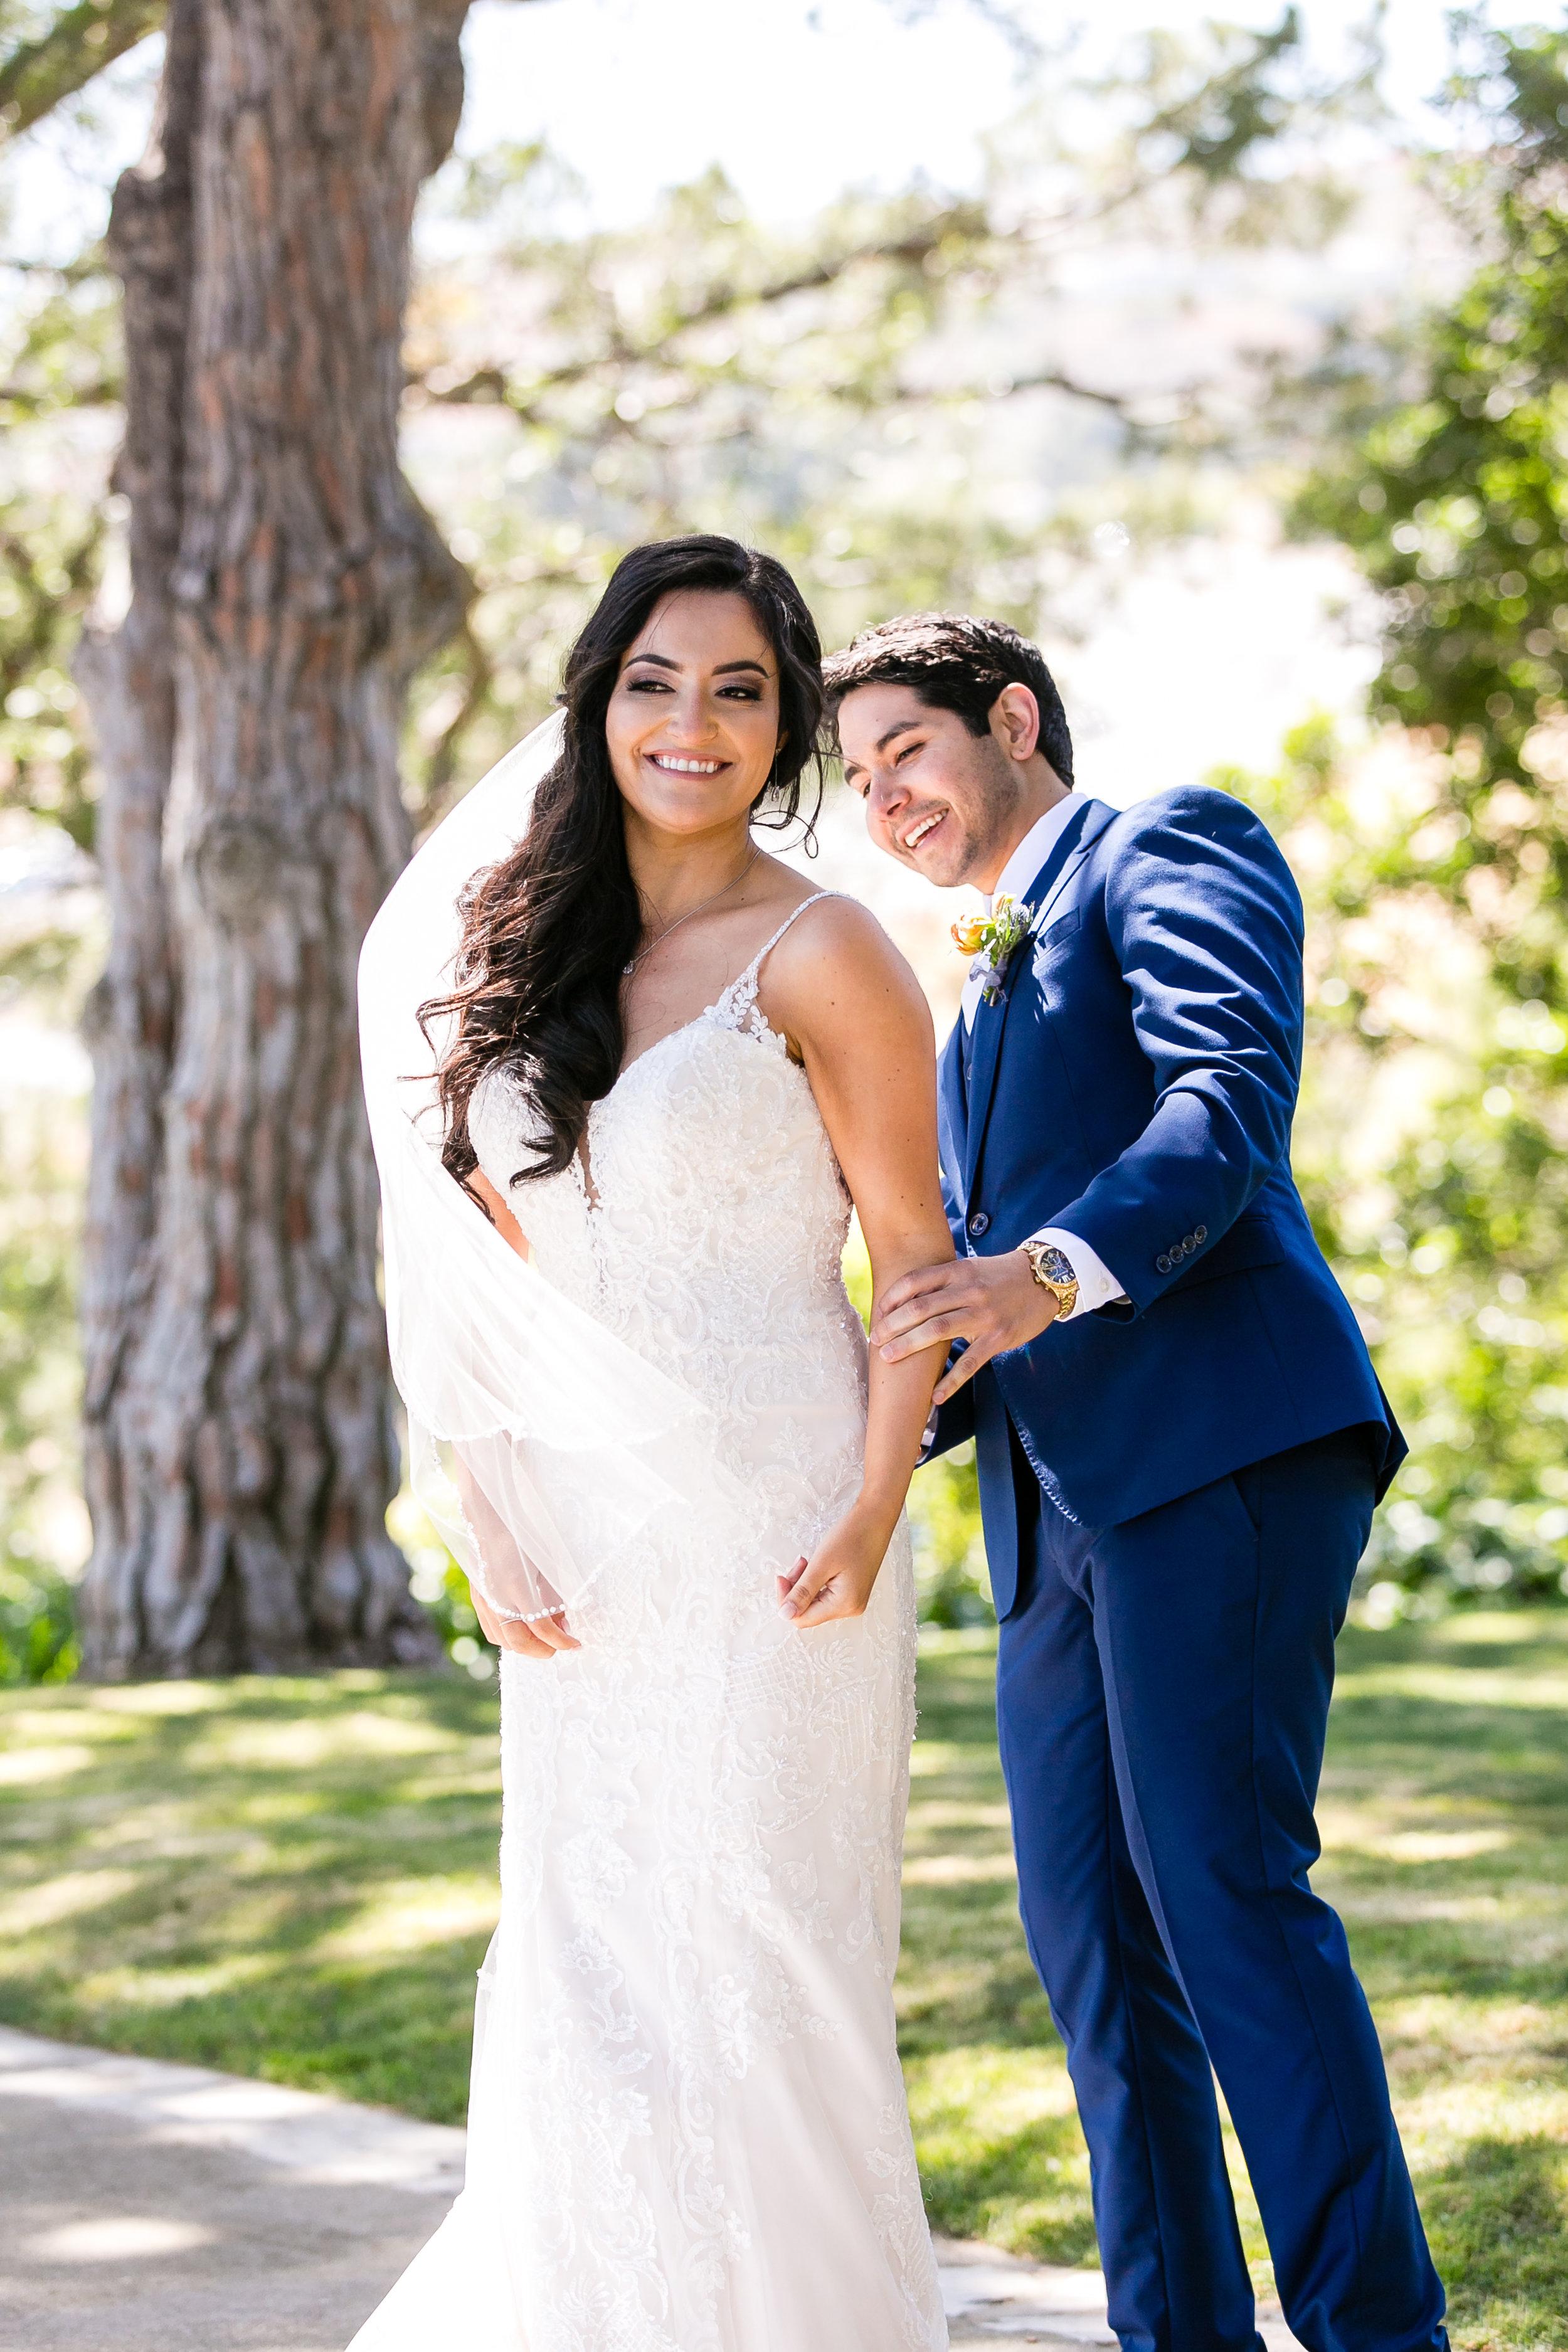 2019_05_24_Wedding_Barajas_0331.jpg